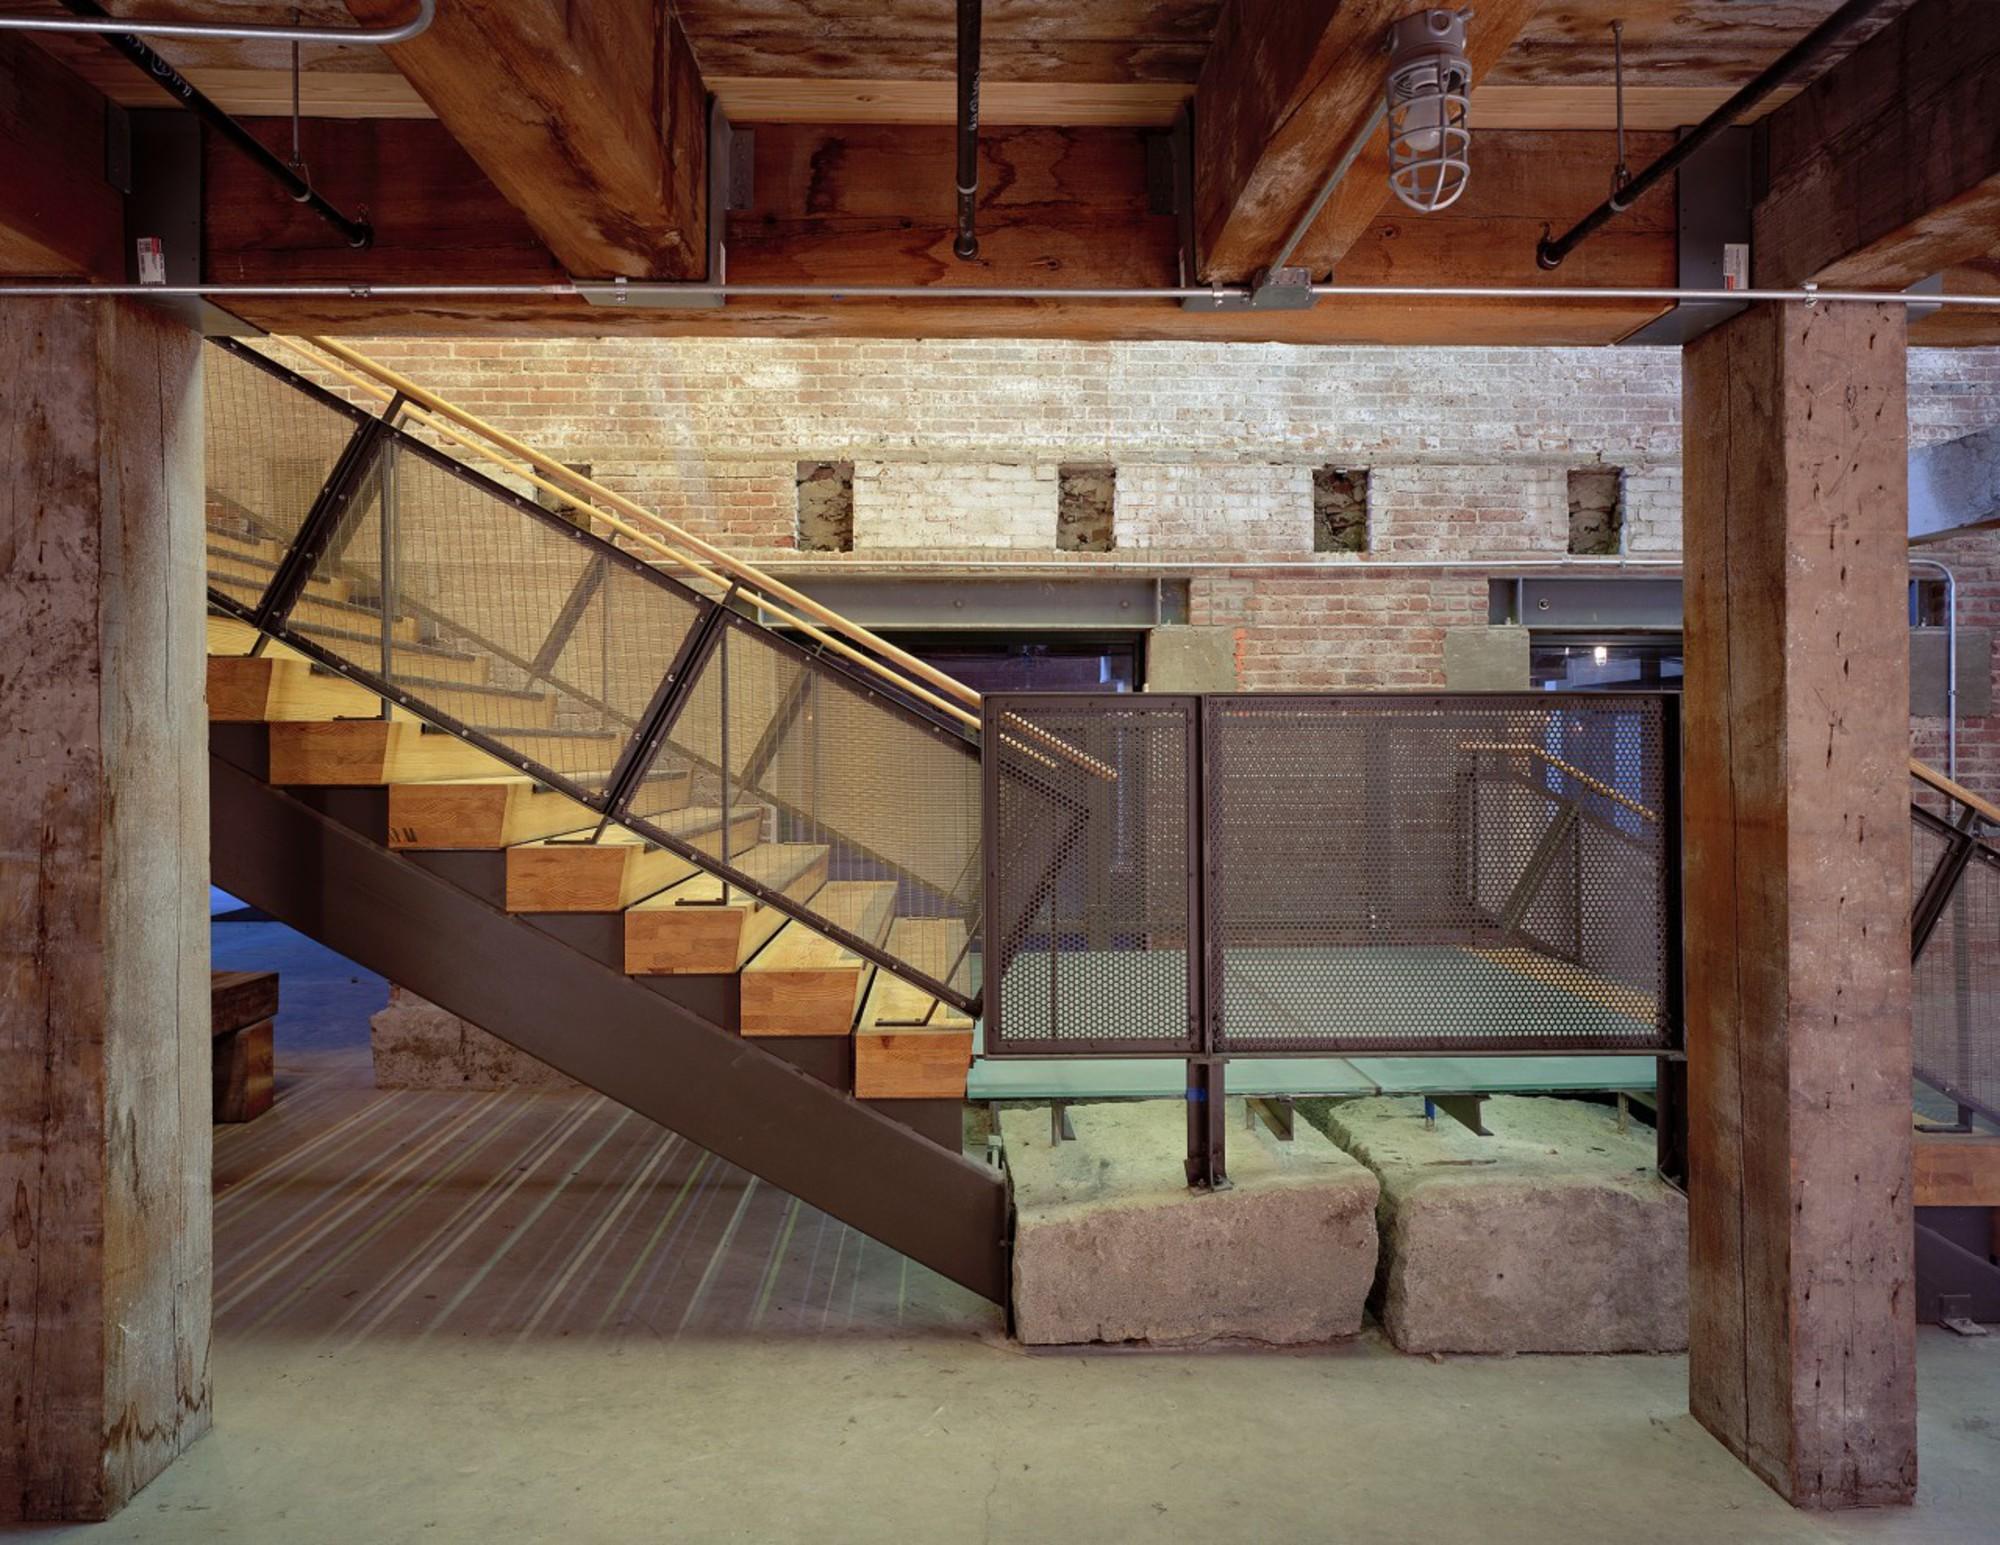 Midway Artist Studios - Stair detail